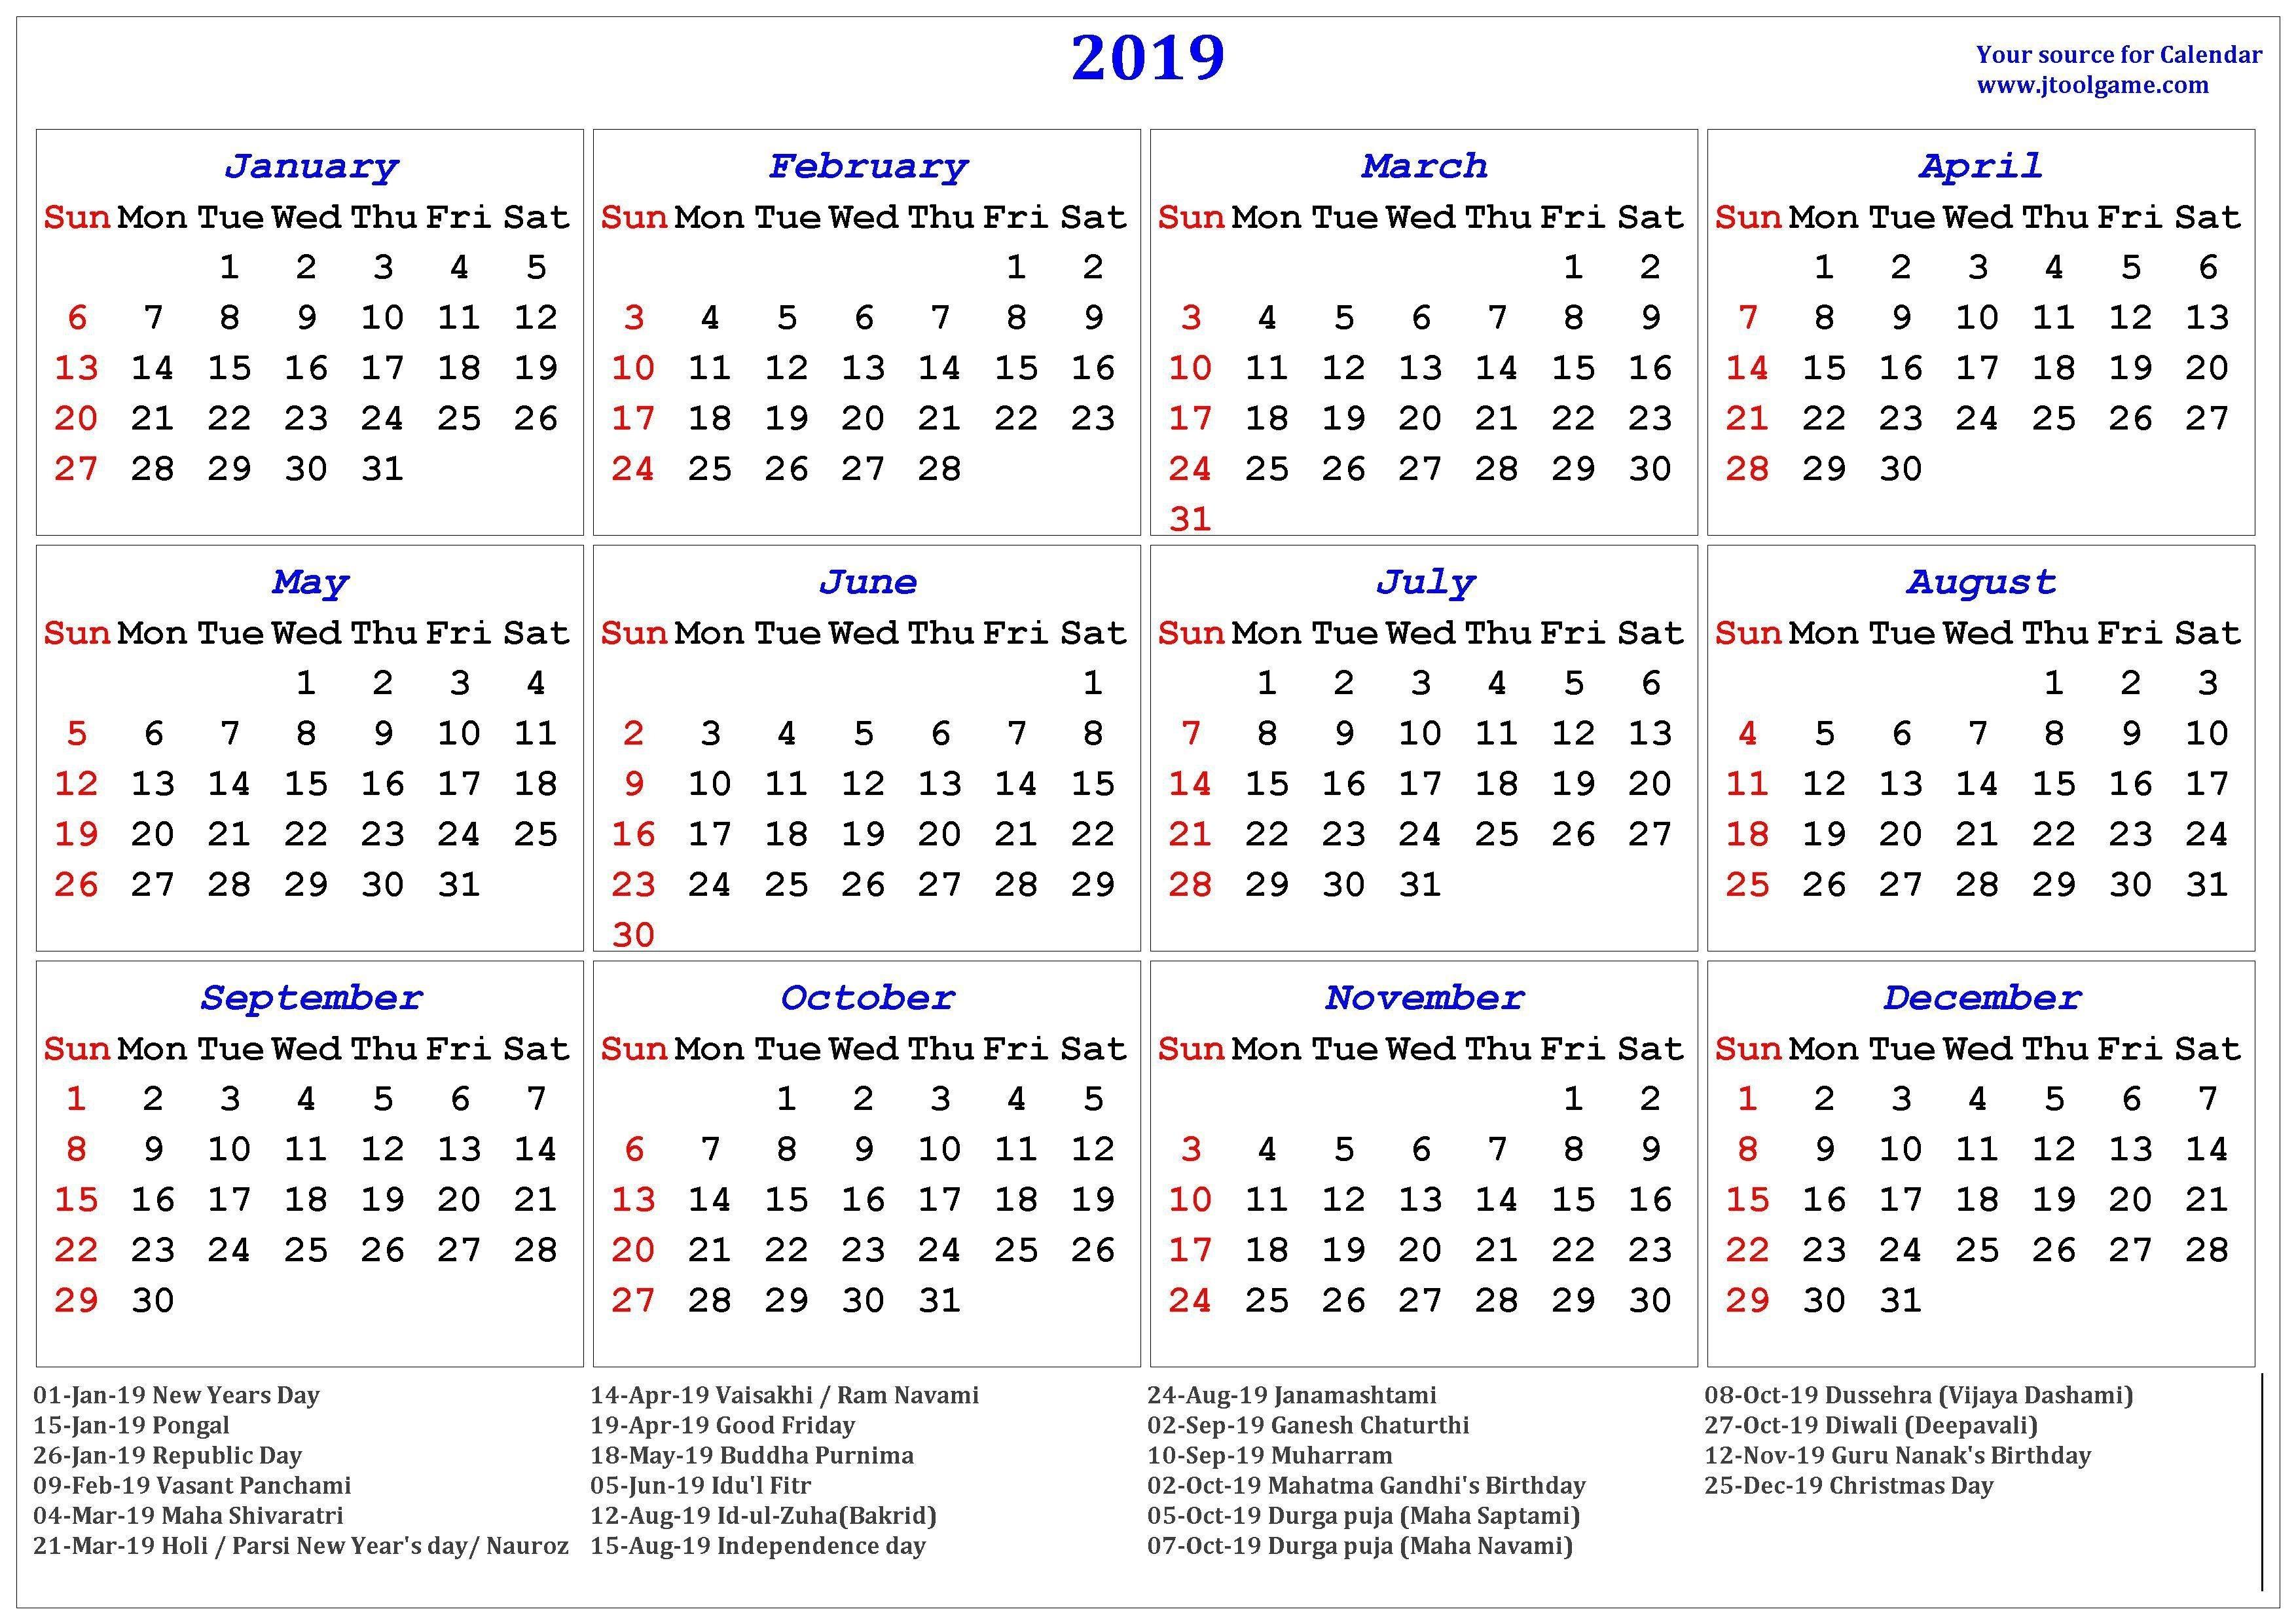 2019 Hindu Calendar With Tithi   Tyohar, Holidays, Festivals-Calendar 2020 With Hindi And Holidays Download